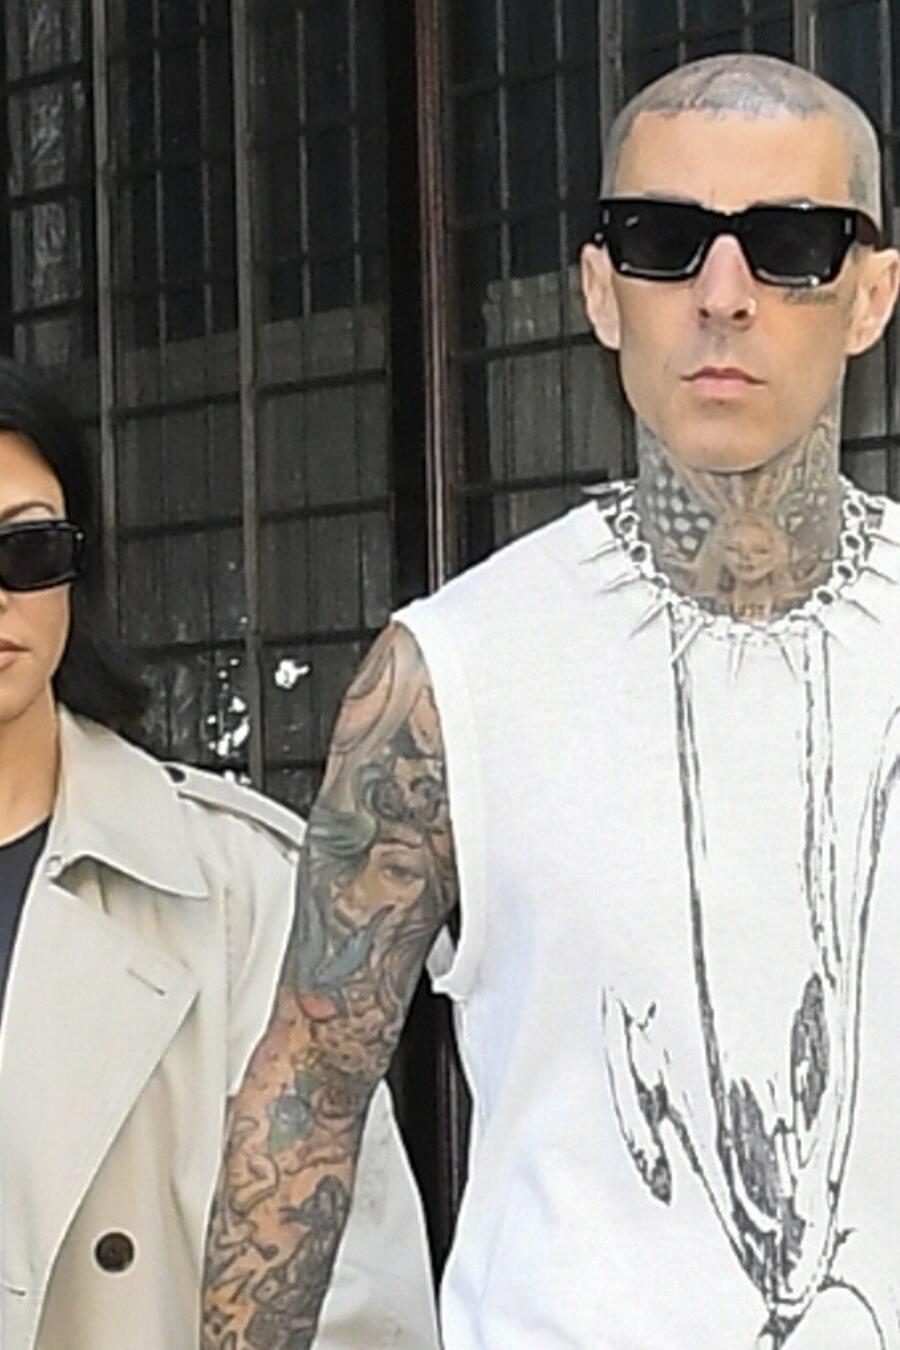 Kourtney Kardashian y su prometido, Travis Barker, caminando de la mano.